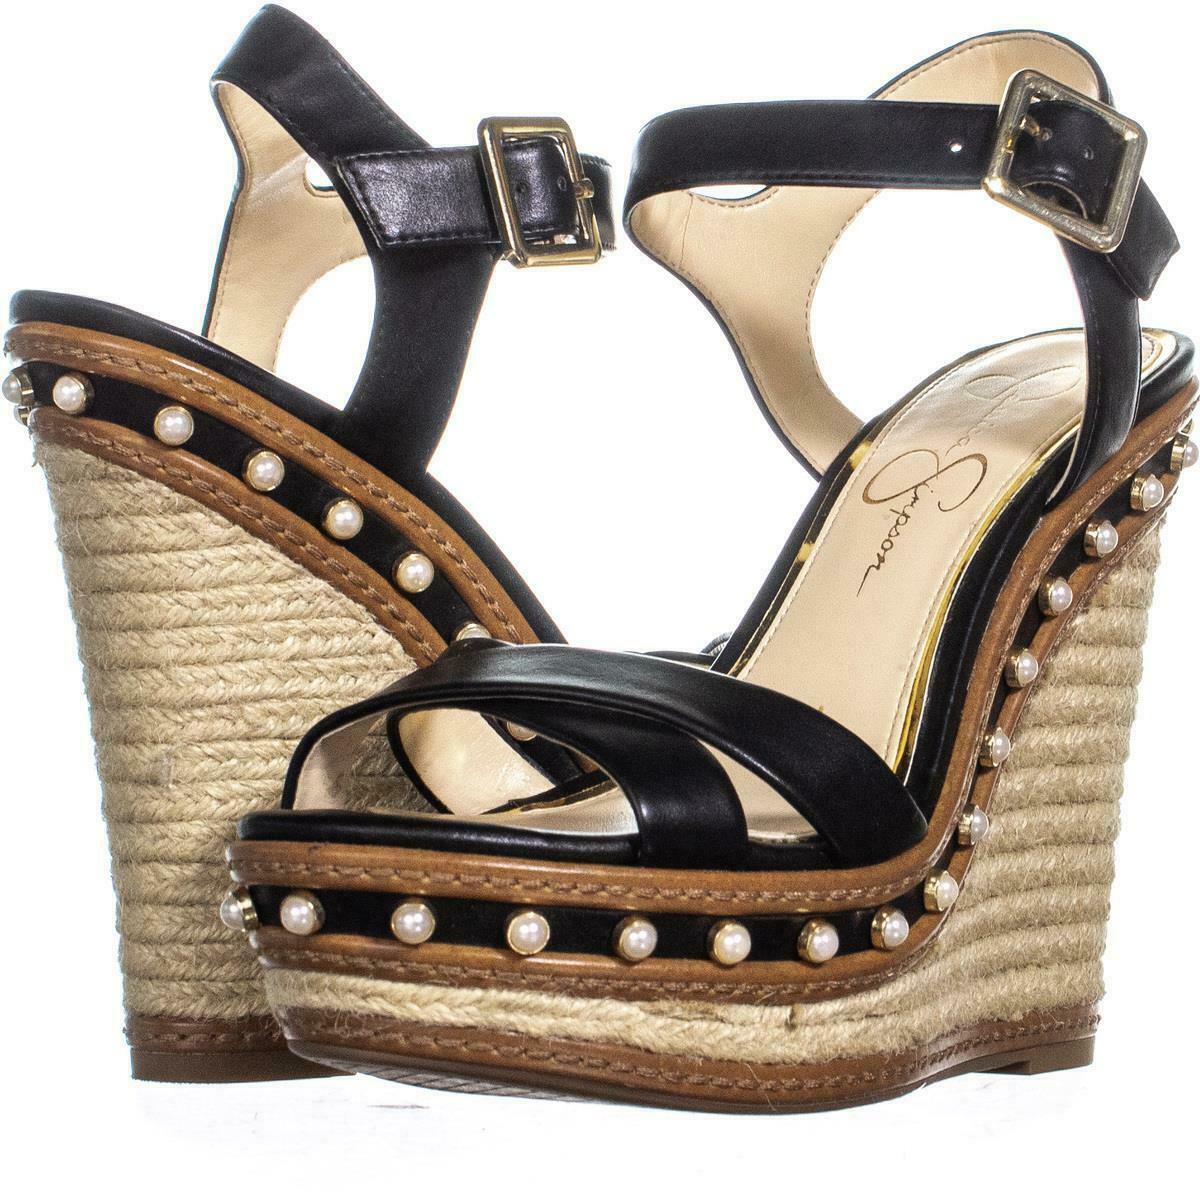 Jessica Simpson Aeralin Wedge Slingback Sandals 867 Black